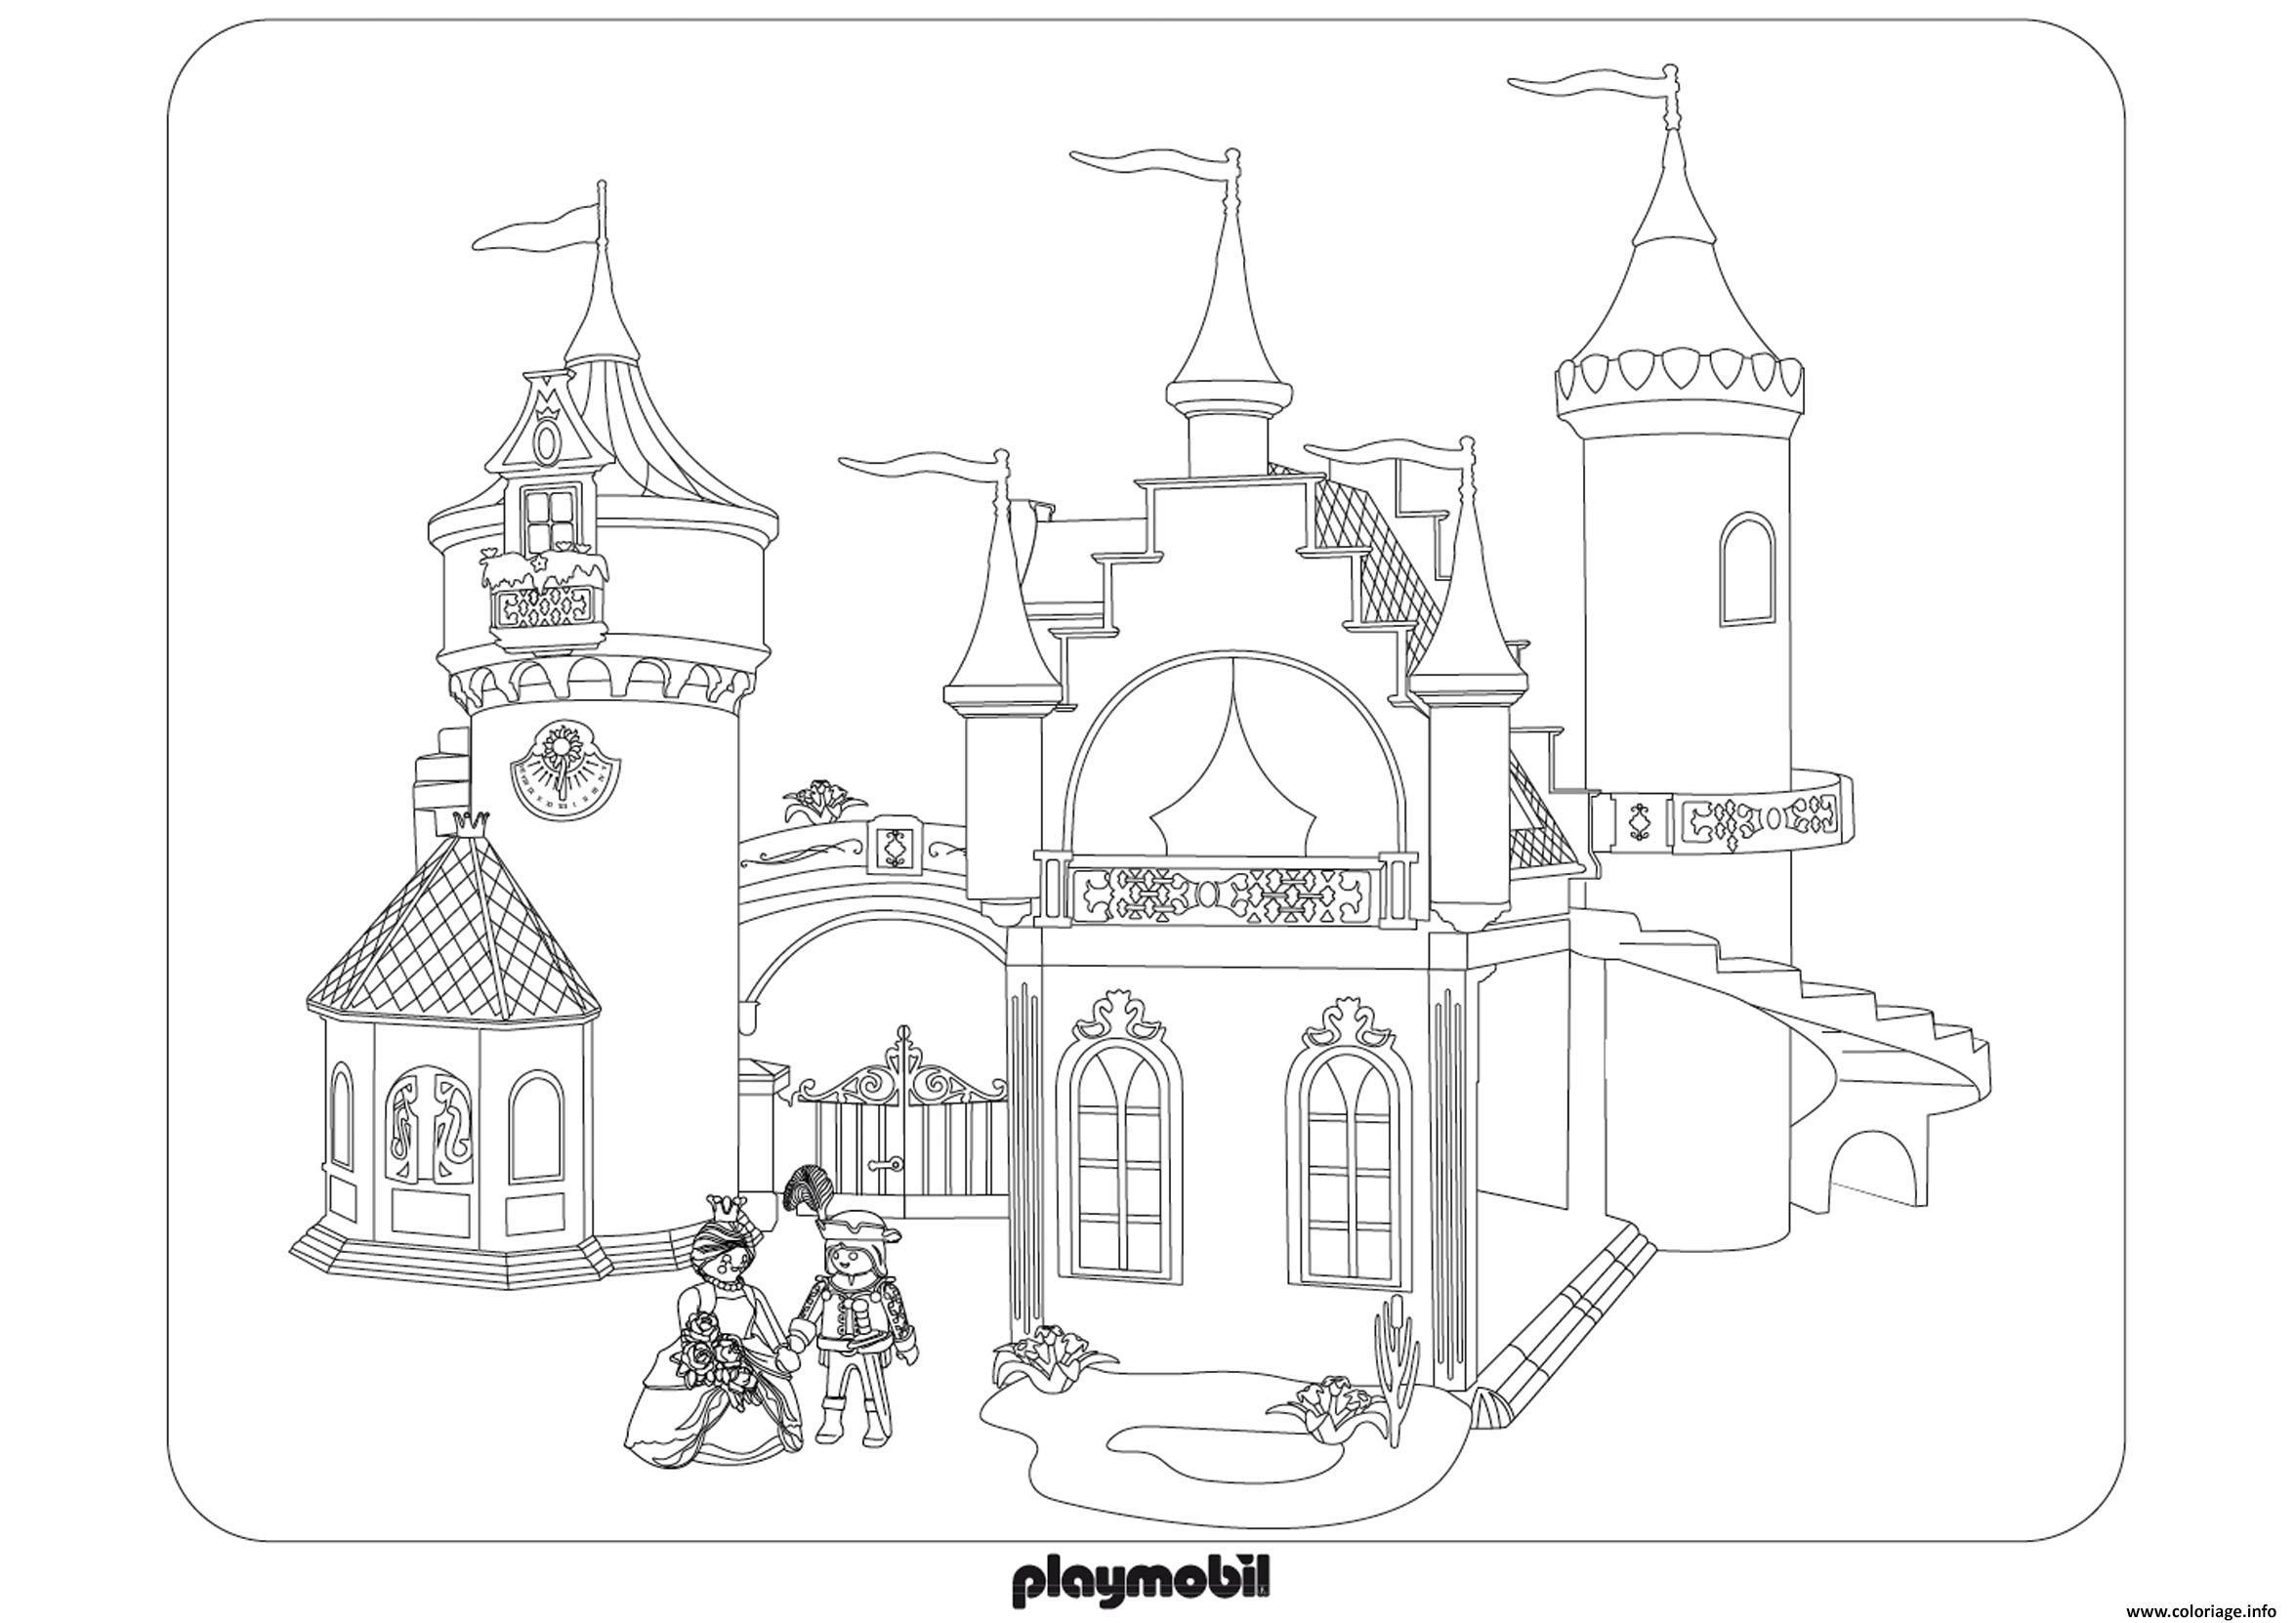 Coloriage chateau roi reine princesse playmobil dessin - Coloriage chateau de princesse ...